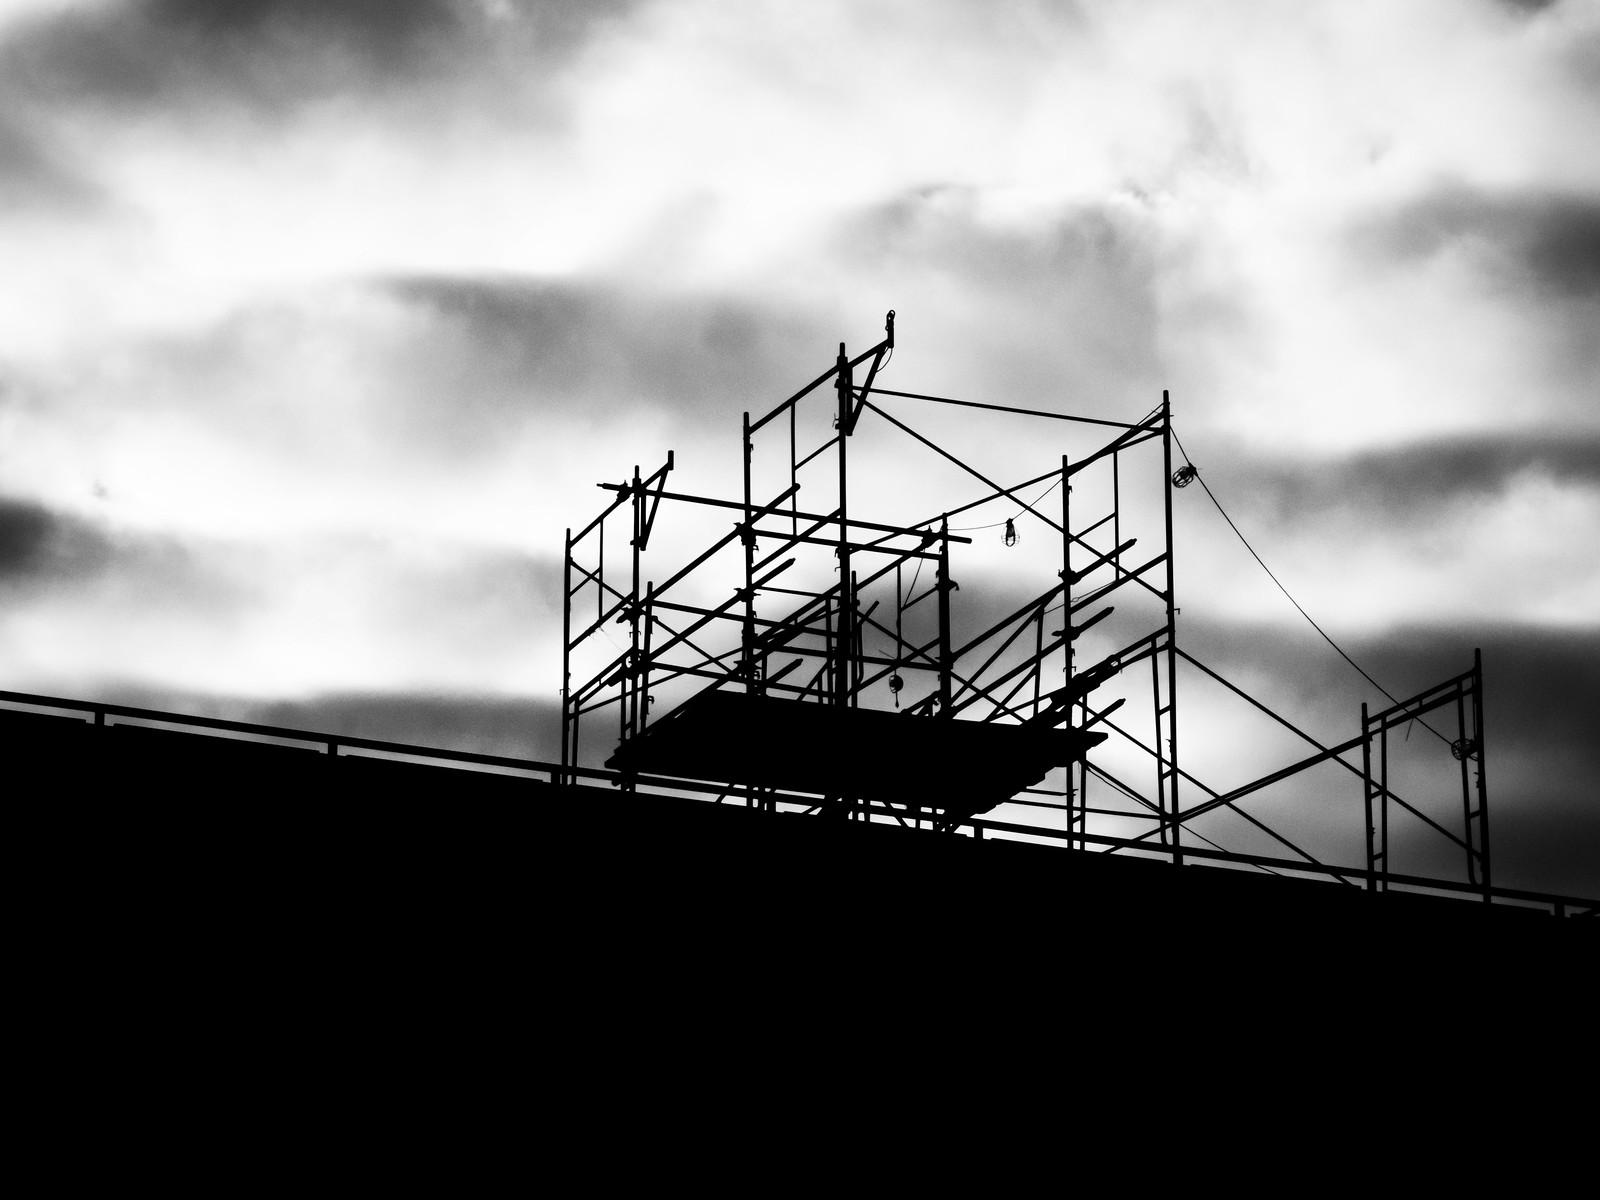 Scaffold and Turbulent Sky by wwward0